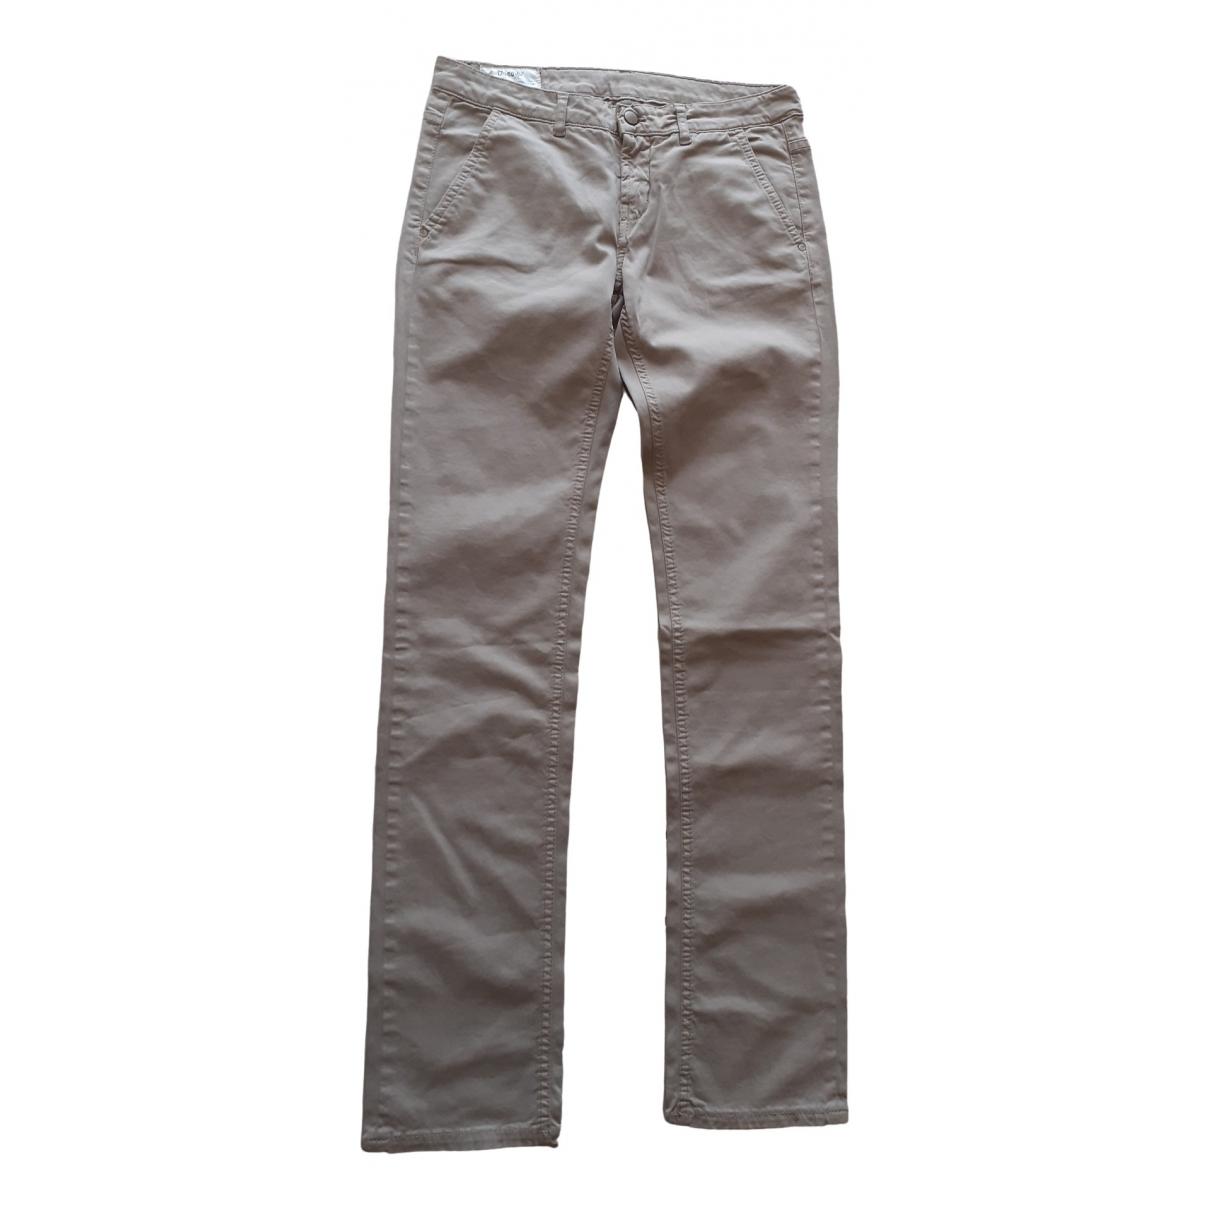 Pantalones en Algodon Beige Dondup